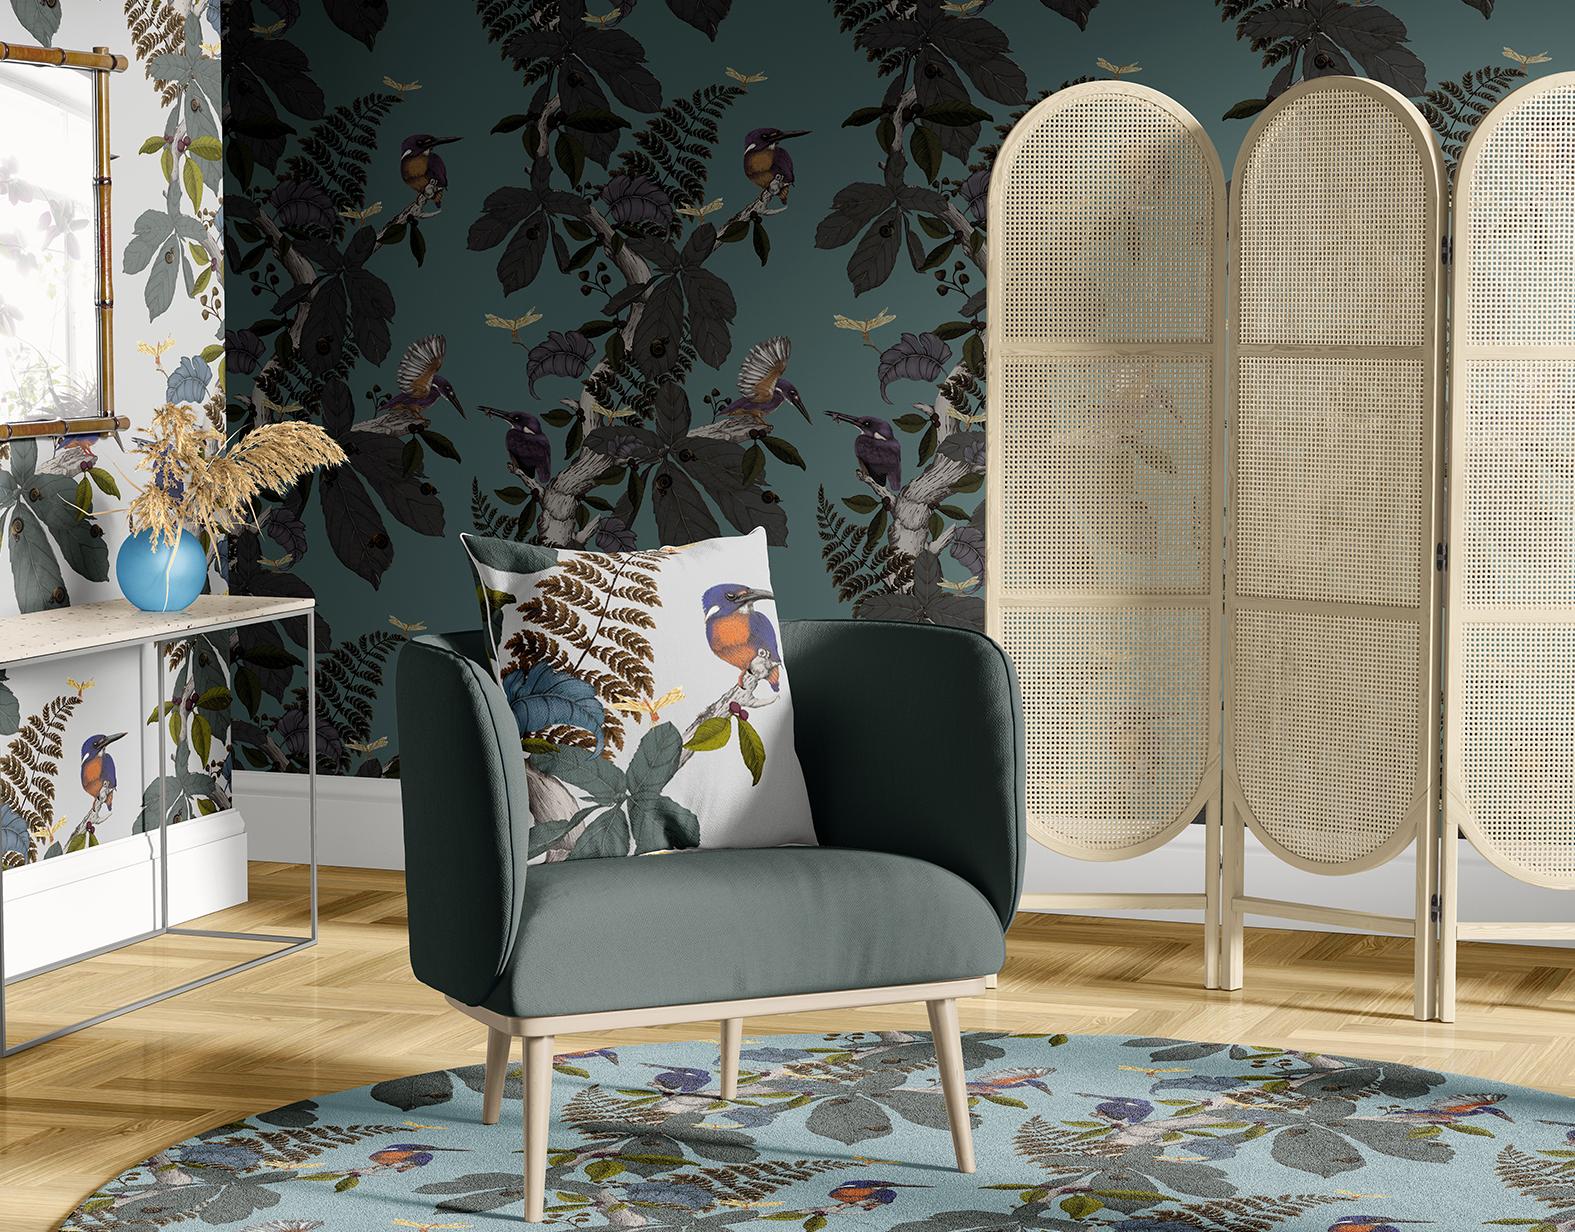 Interior scene featuring Kingfisher walllpaper original fig on moss ground